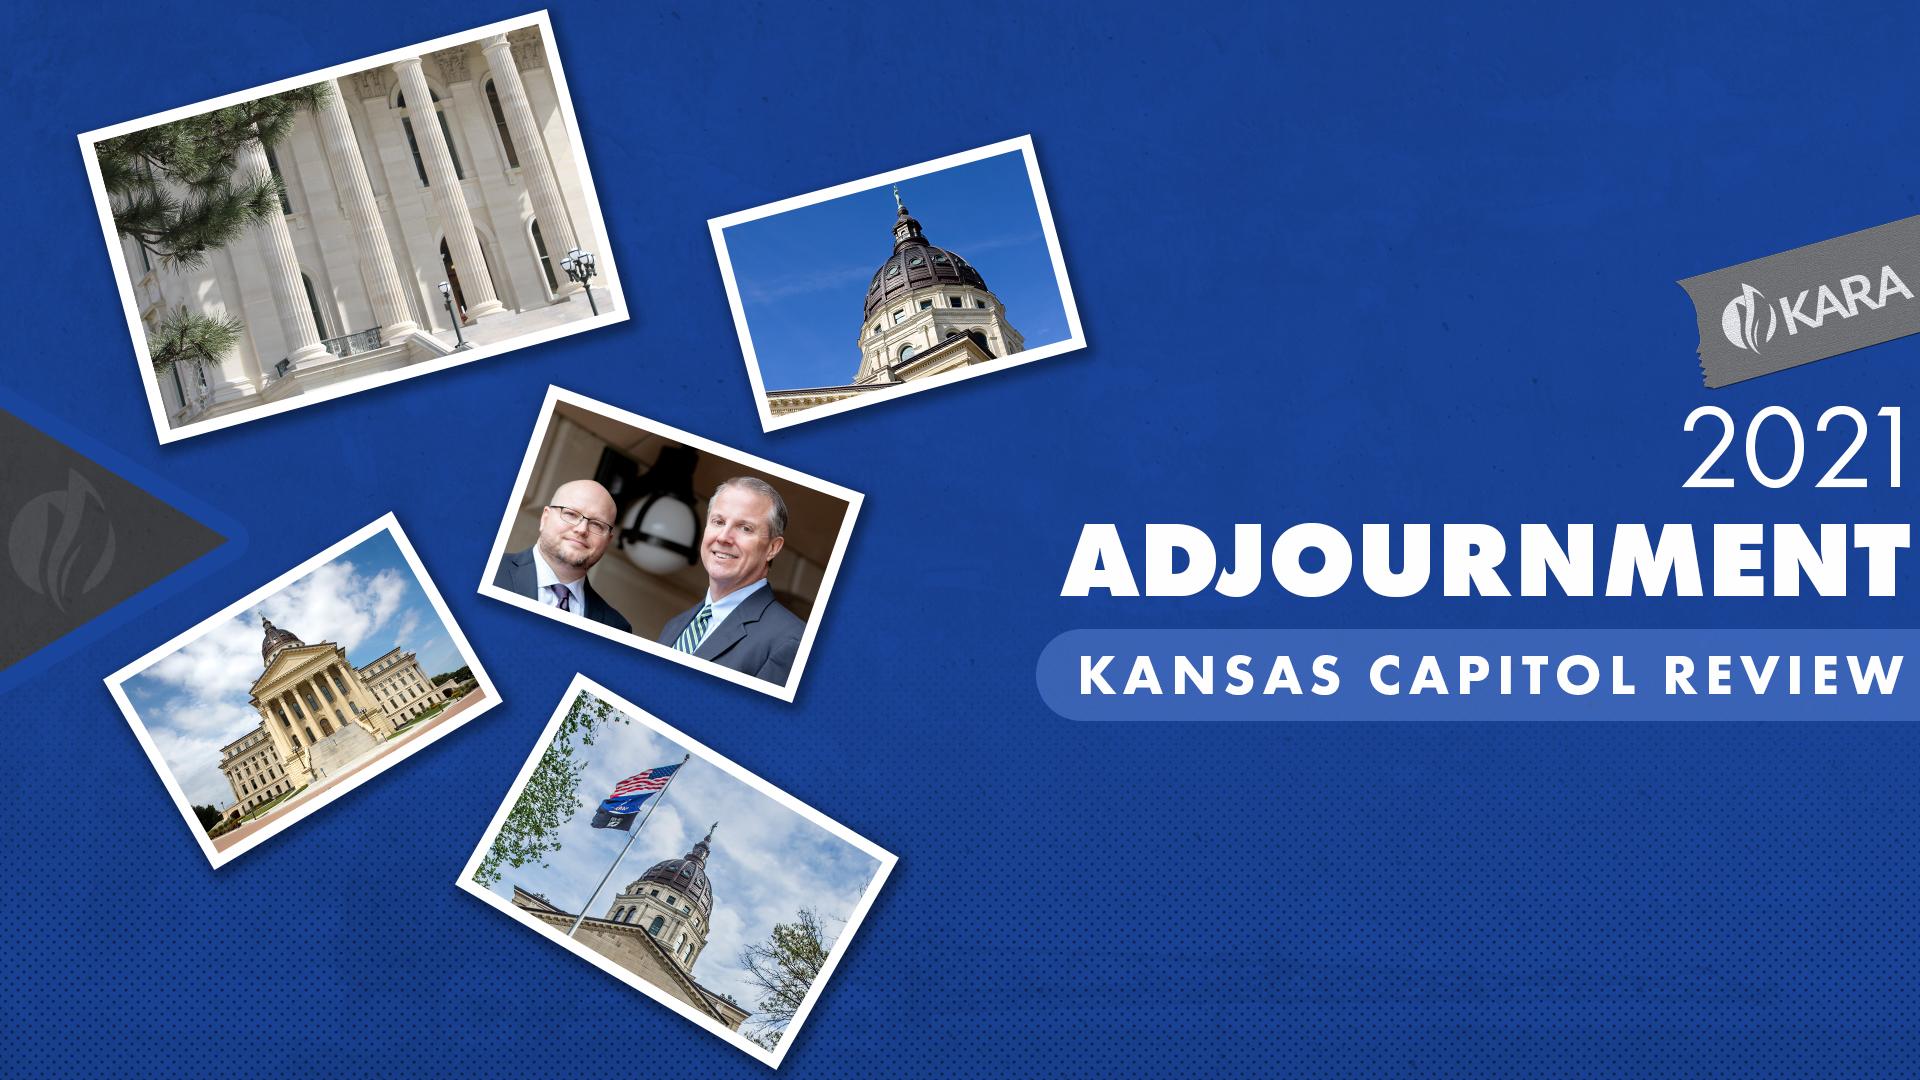 2021 Kansas Capitol Review Adjournment